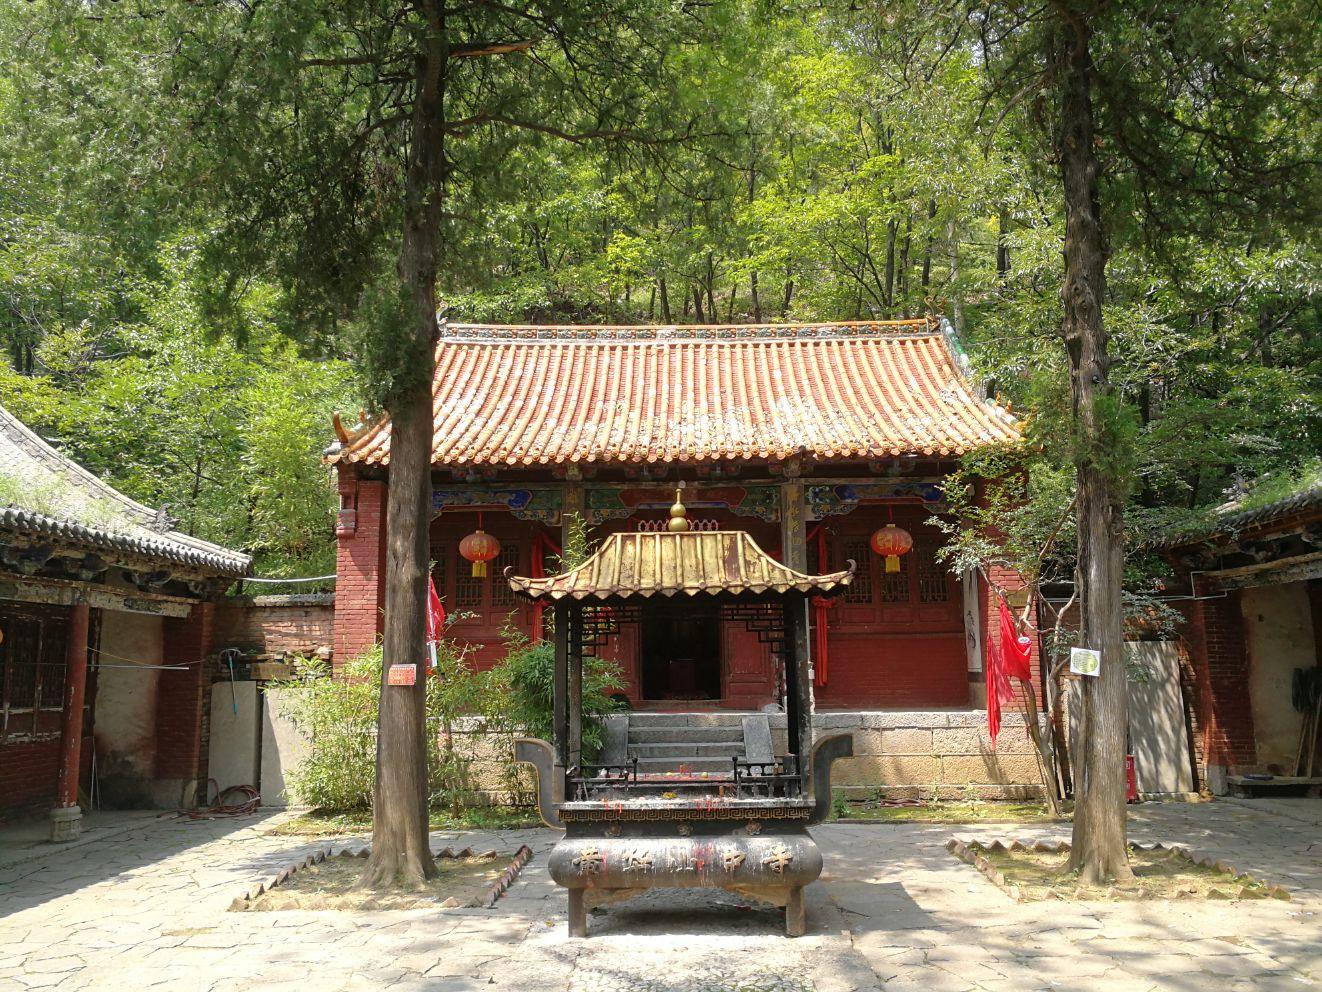 Huanghua Mountain Scenic Area